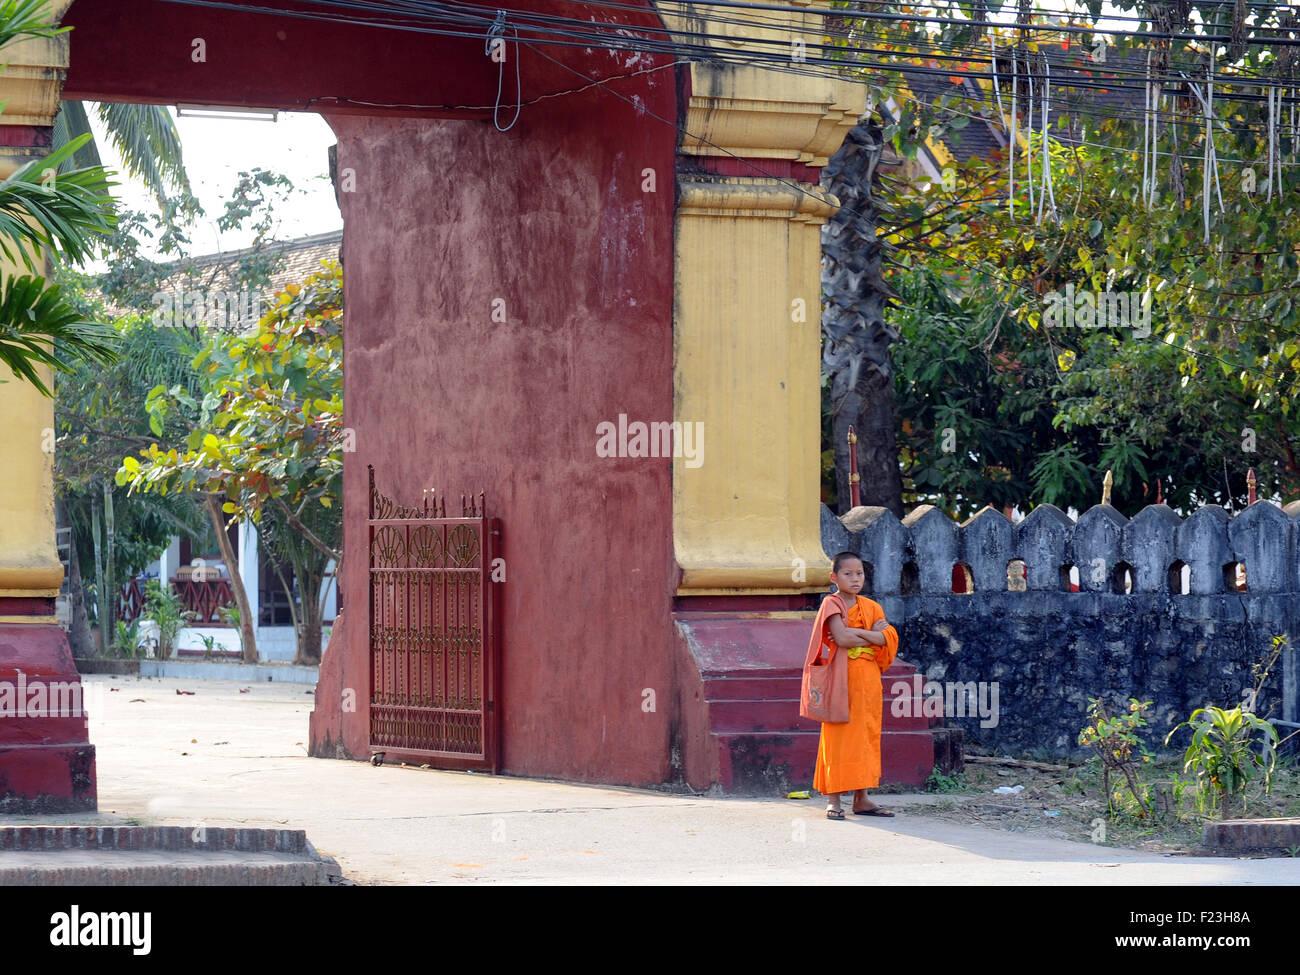 Lao novice monk in saffron robes Luang Prabang, Laos - Stock Image